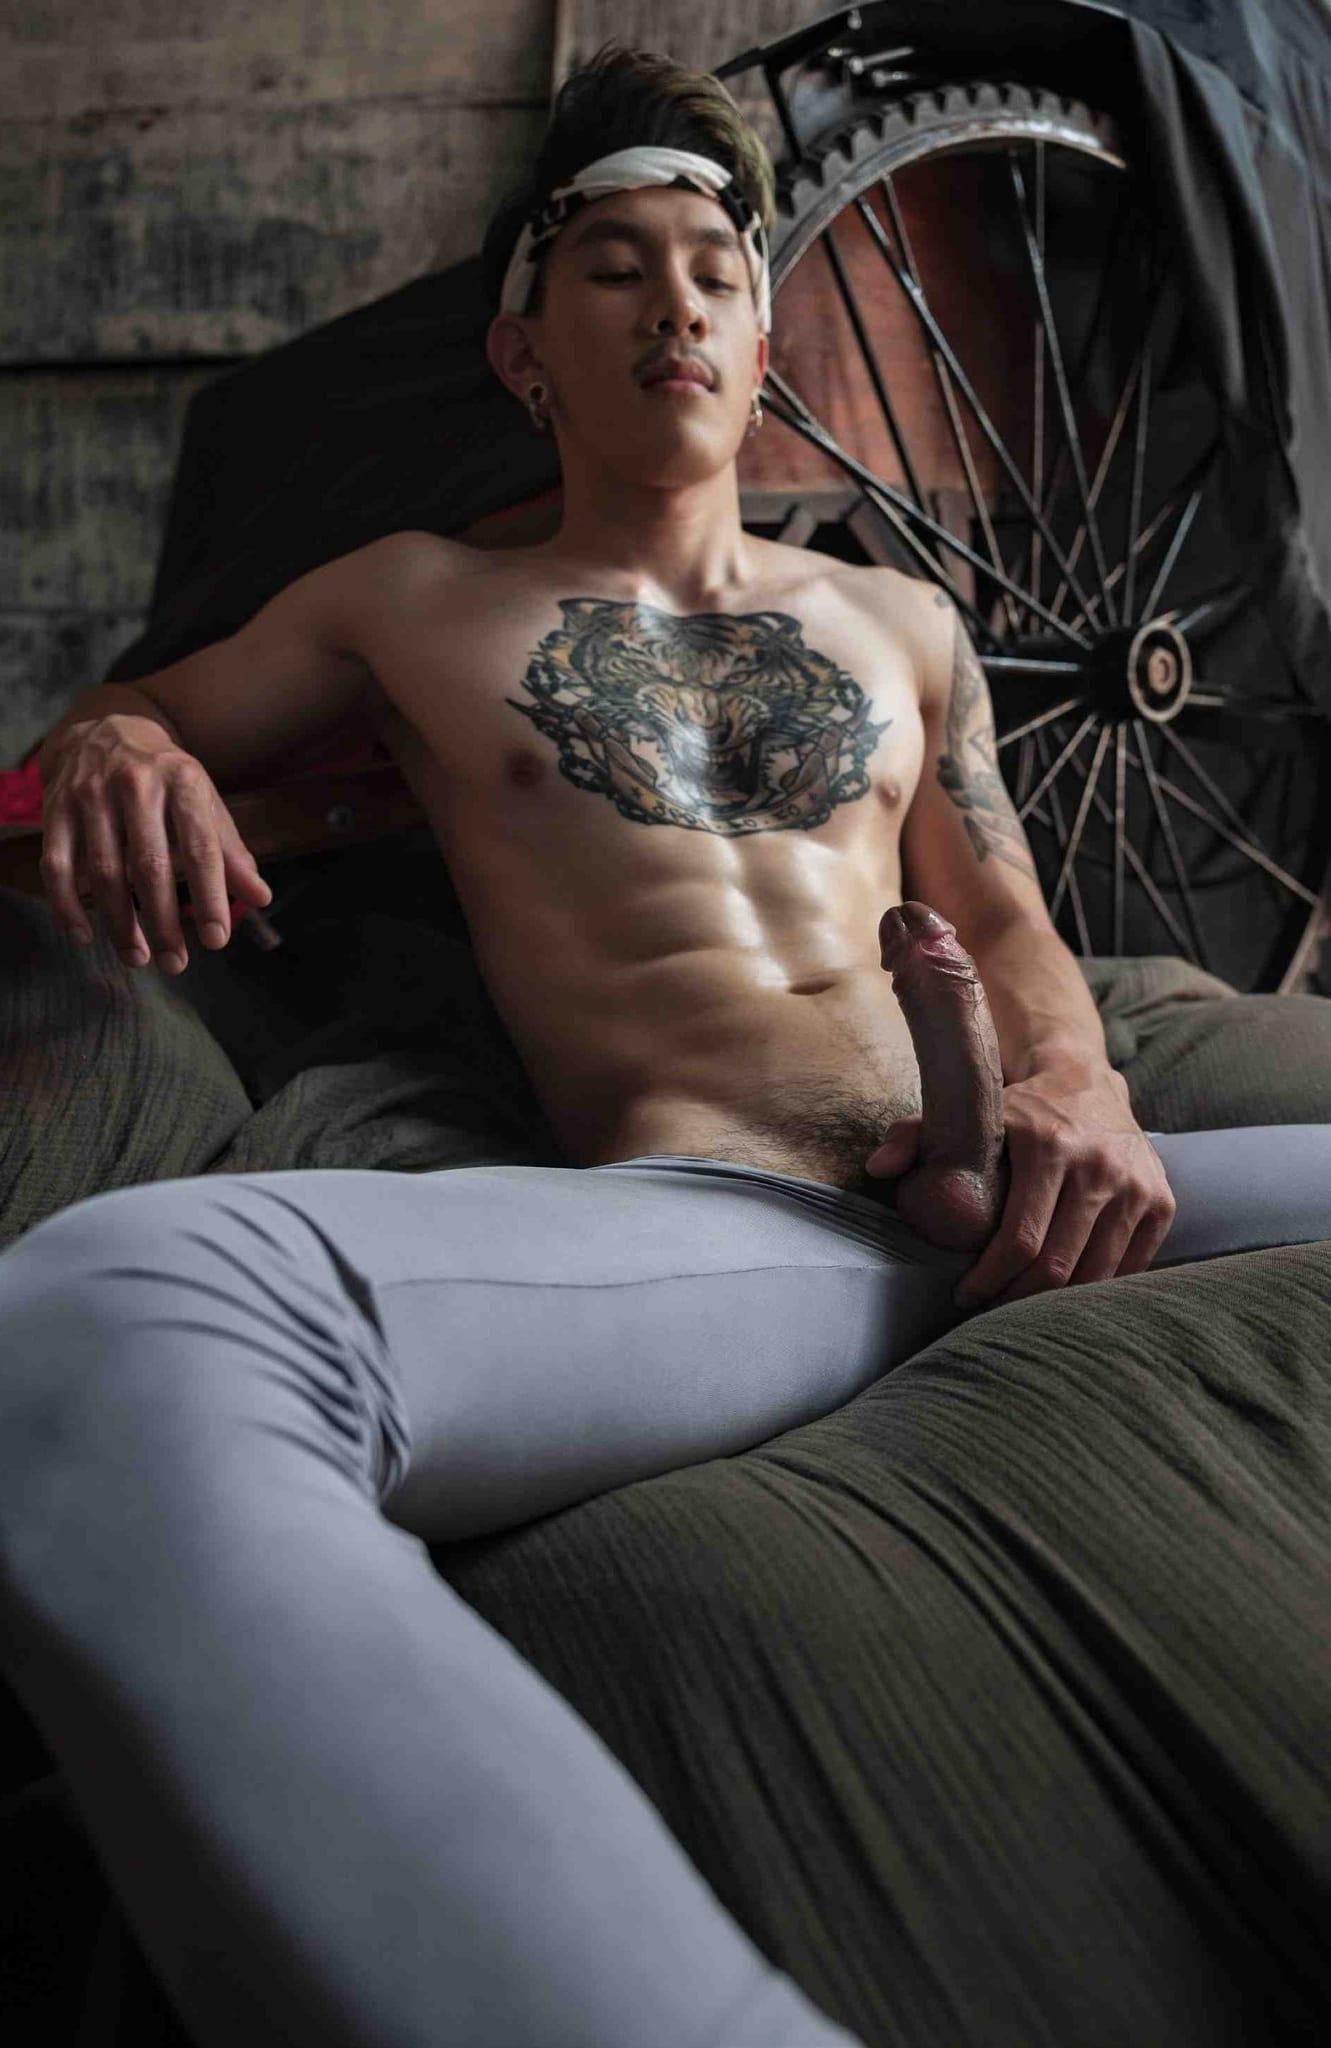 Hard cock and tight pants